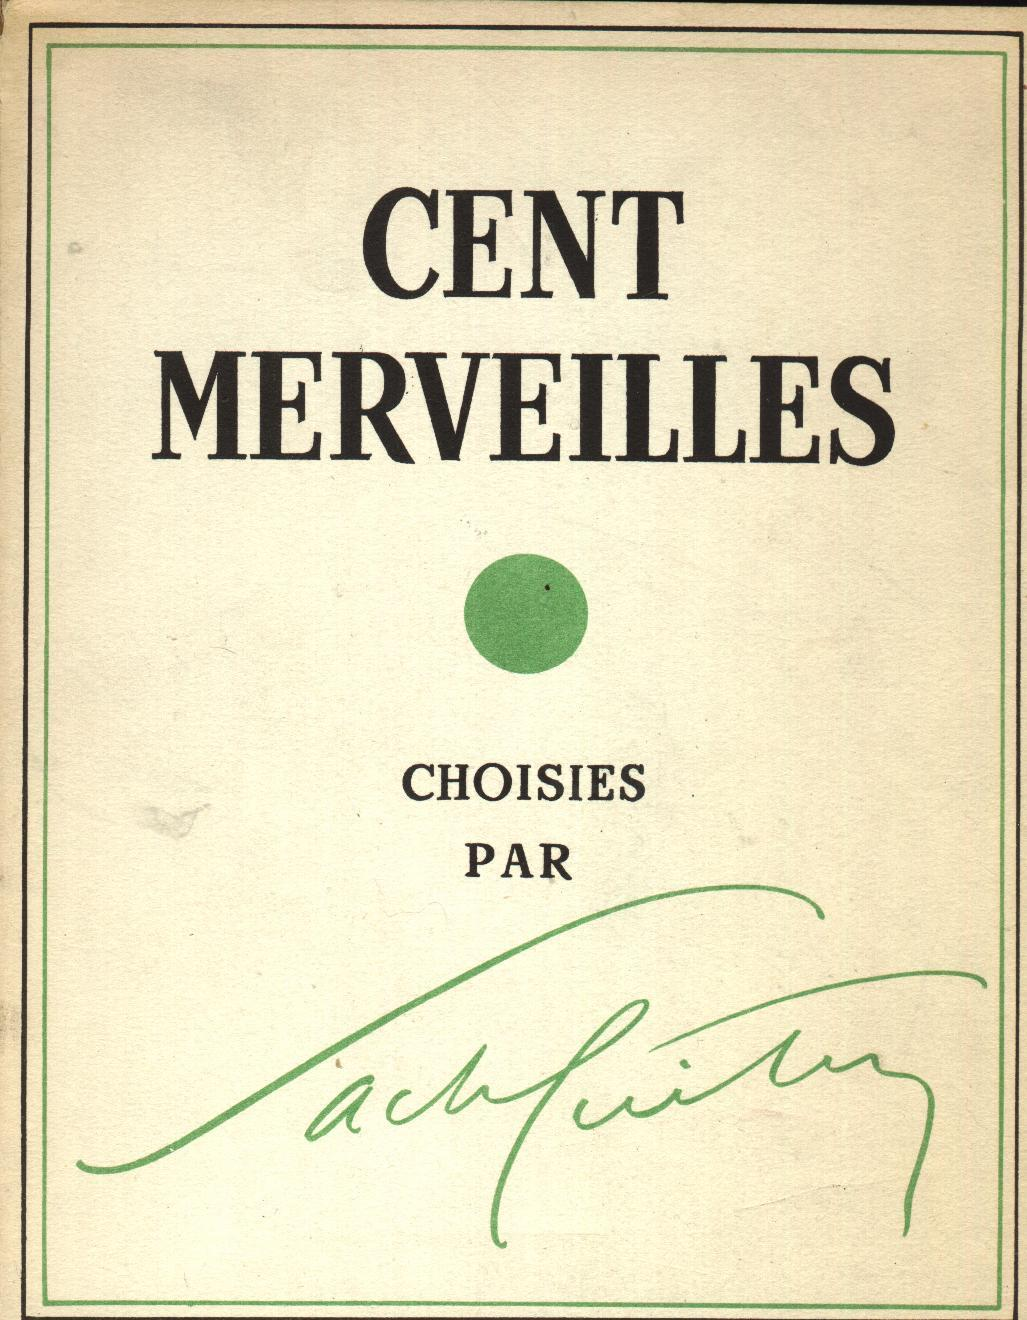 Cent Merveilles Choisies Par Sacha Guitry - Art